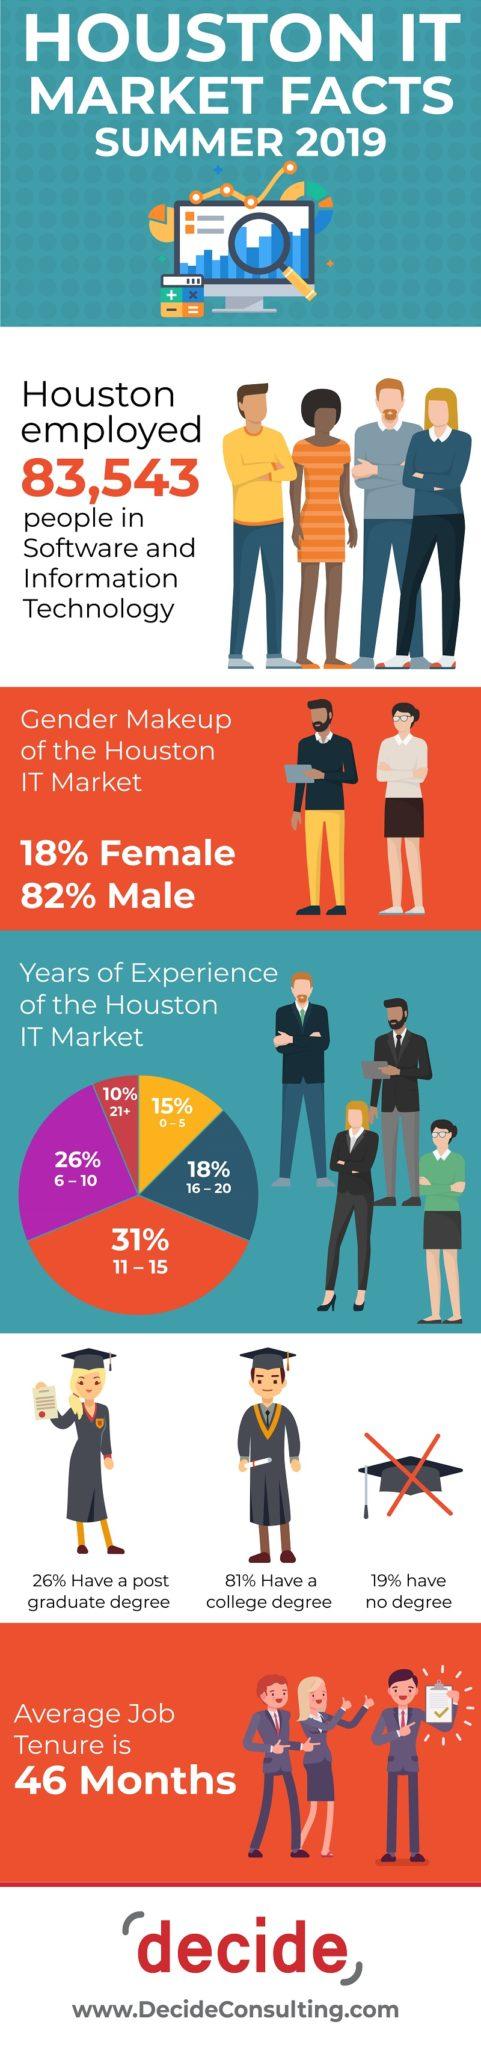 infographic Houston IT market Facts